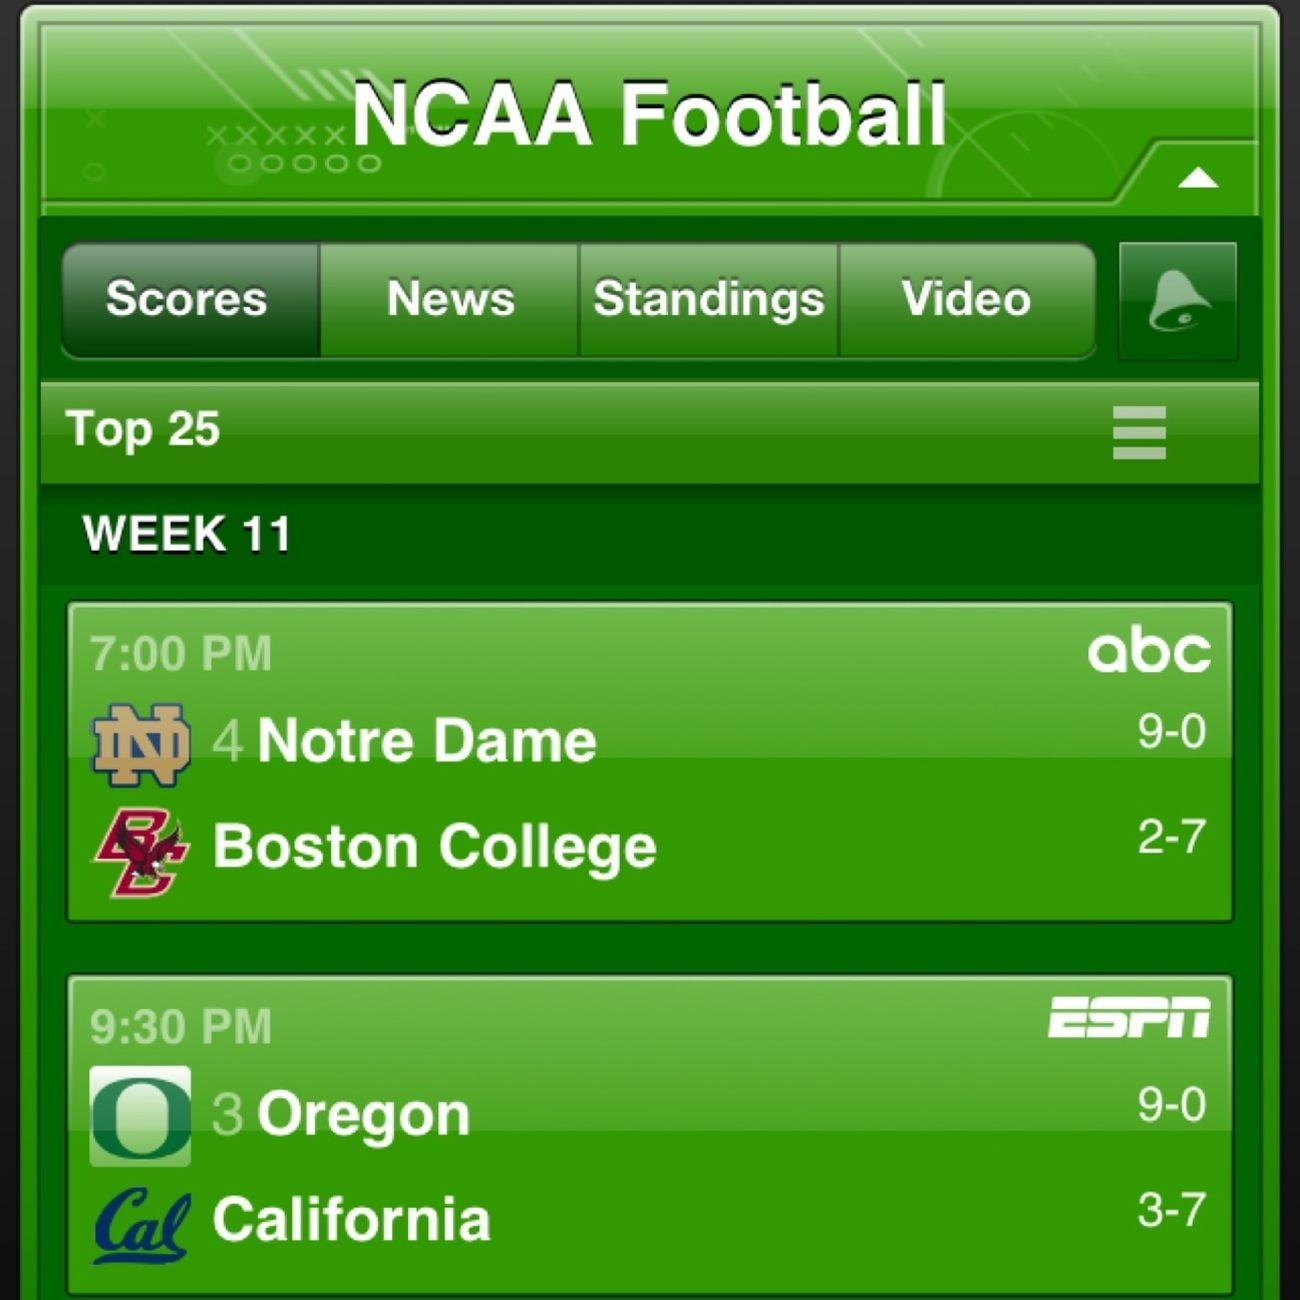 Favorite 2 Teams Oregon Ducks